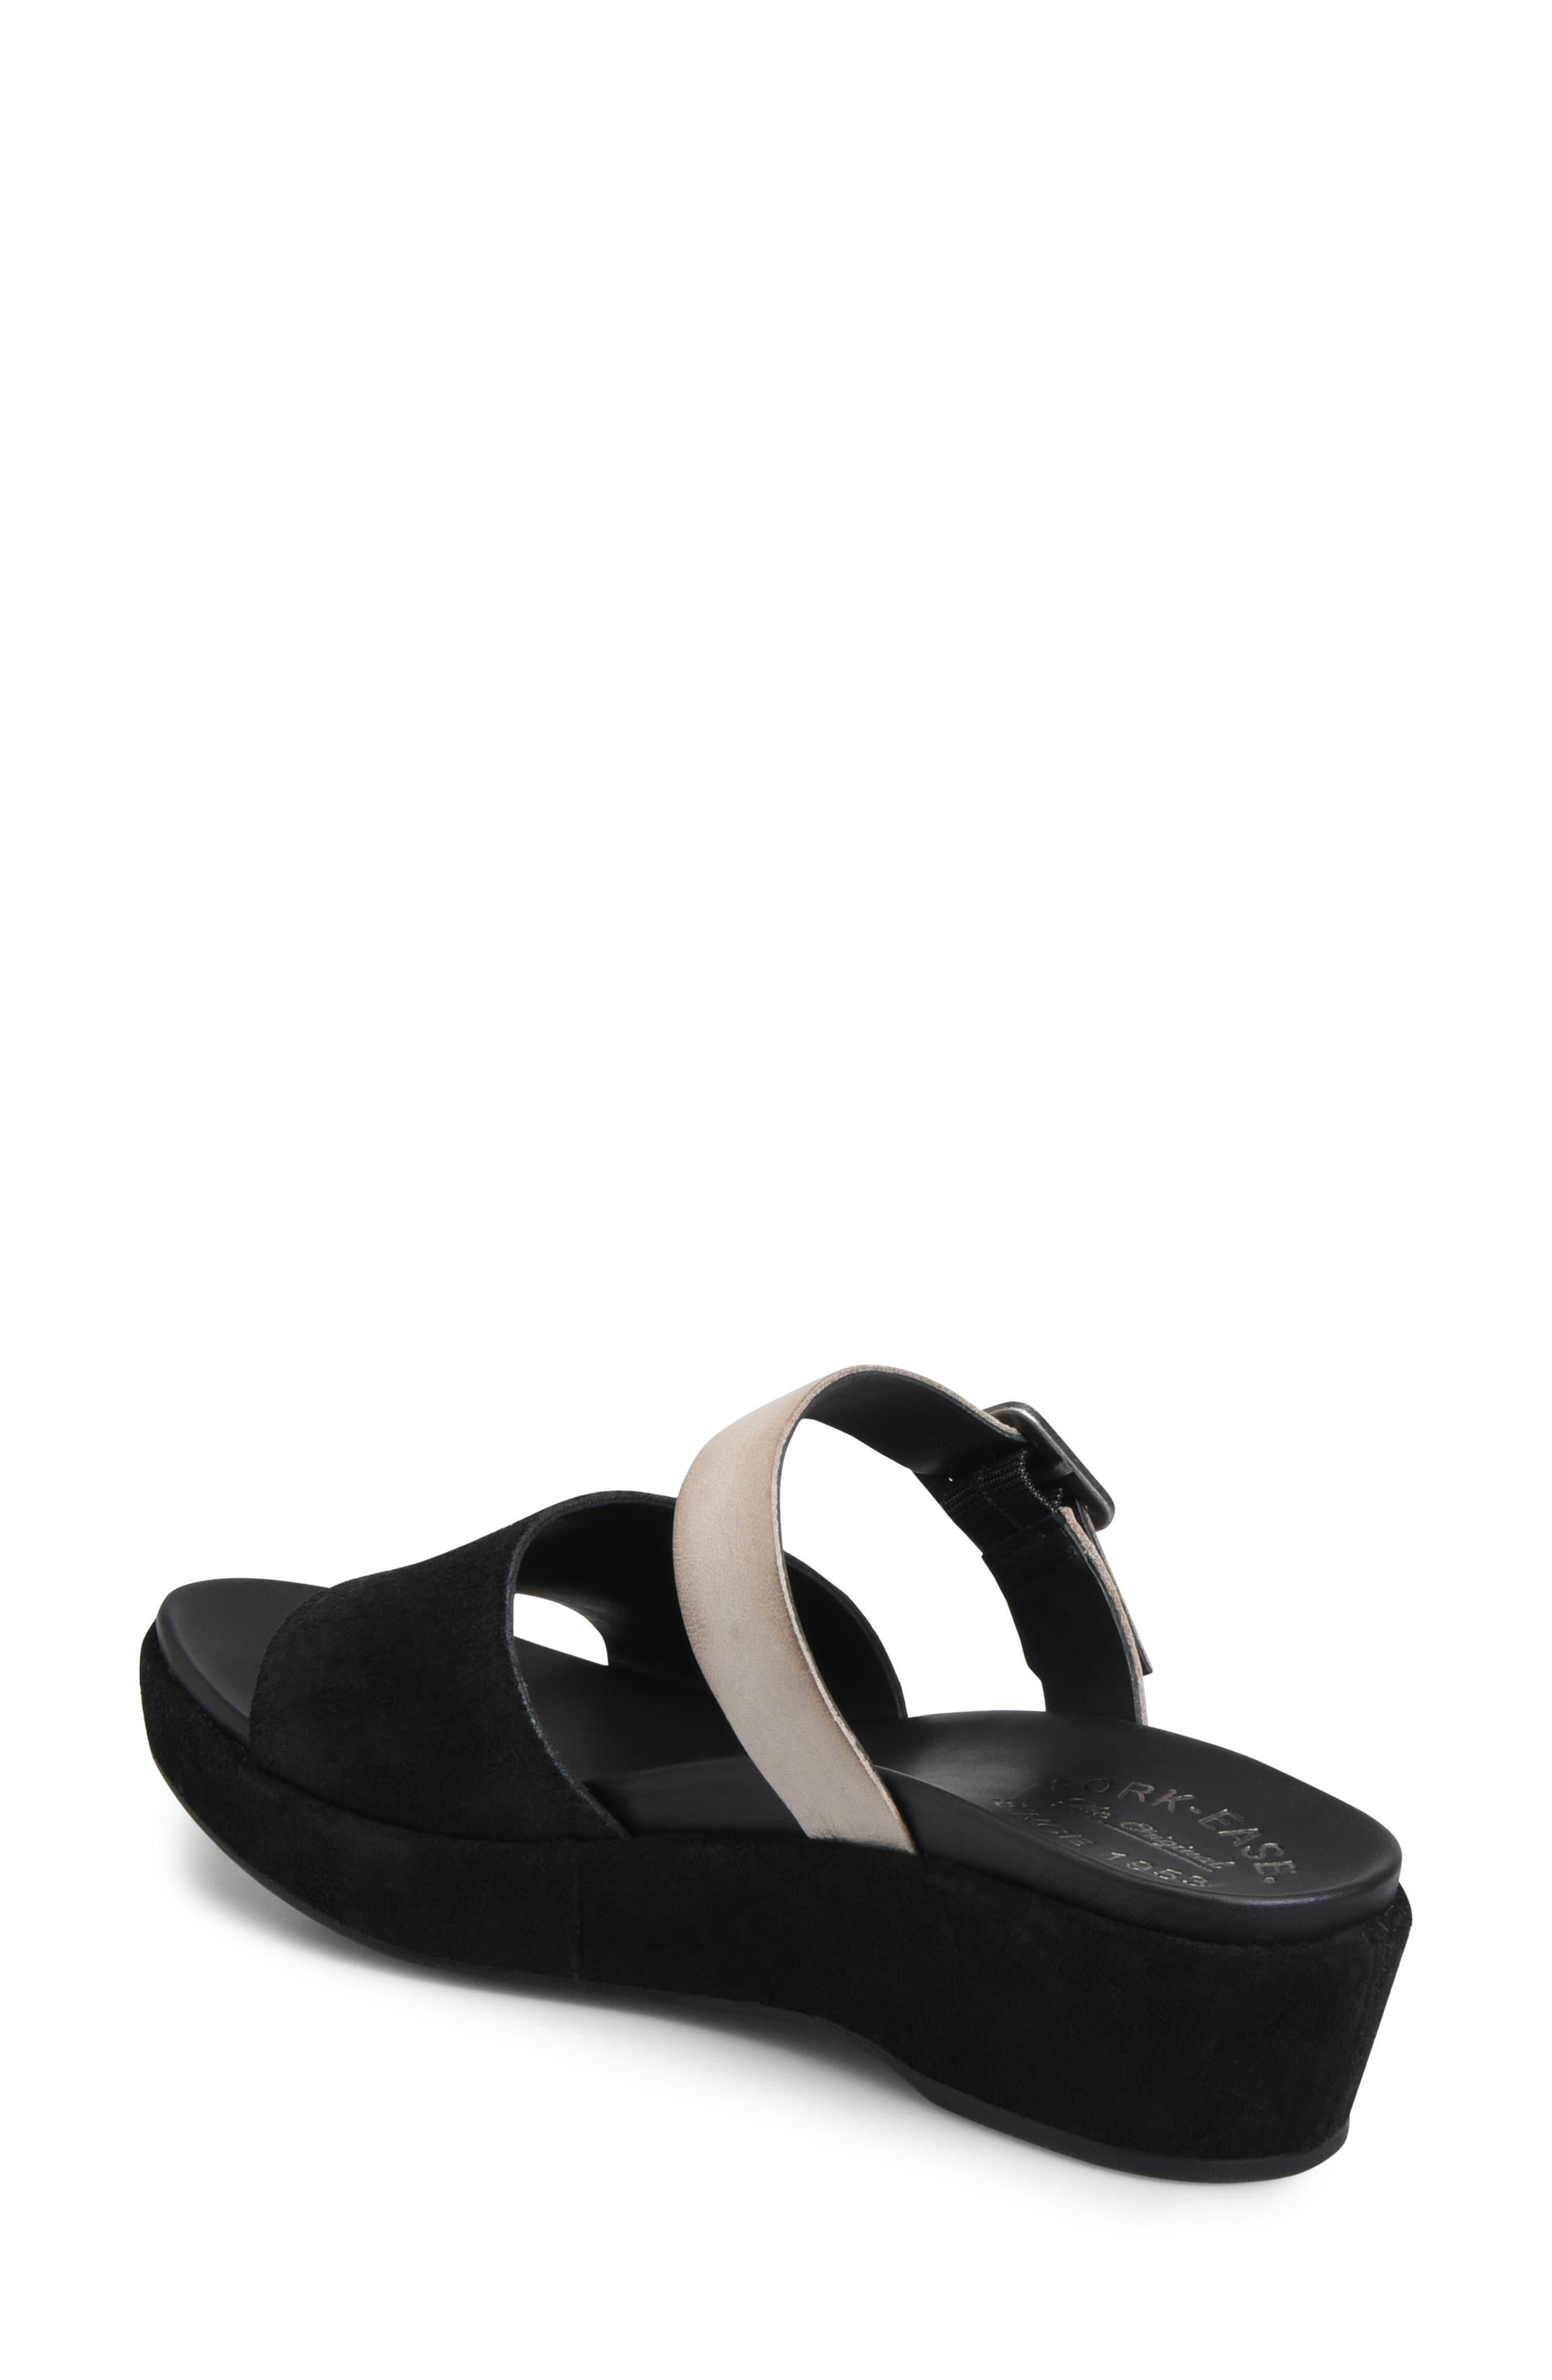 KORK-EASE<SUP>®</SUP>, Bisti Wedge Slide Sandal, Alternate thumbnail 2, color, BLACK/ GREY LEATHER